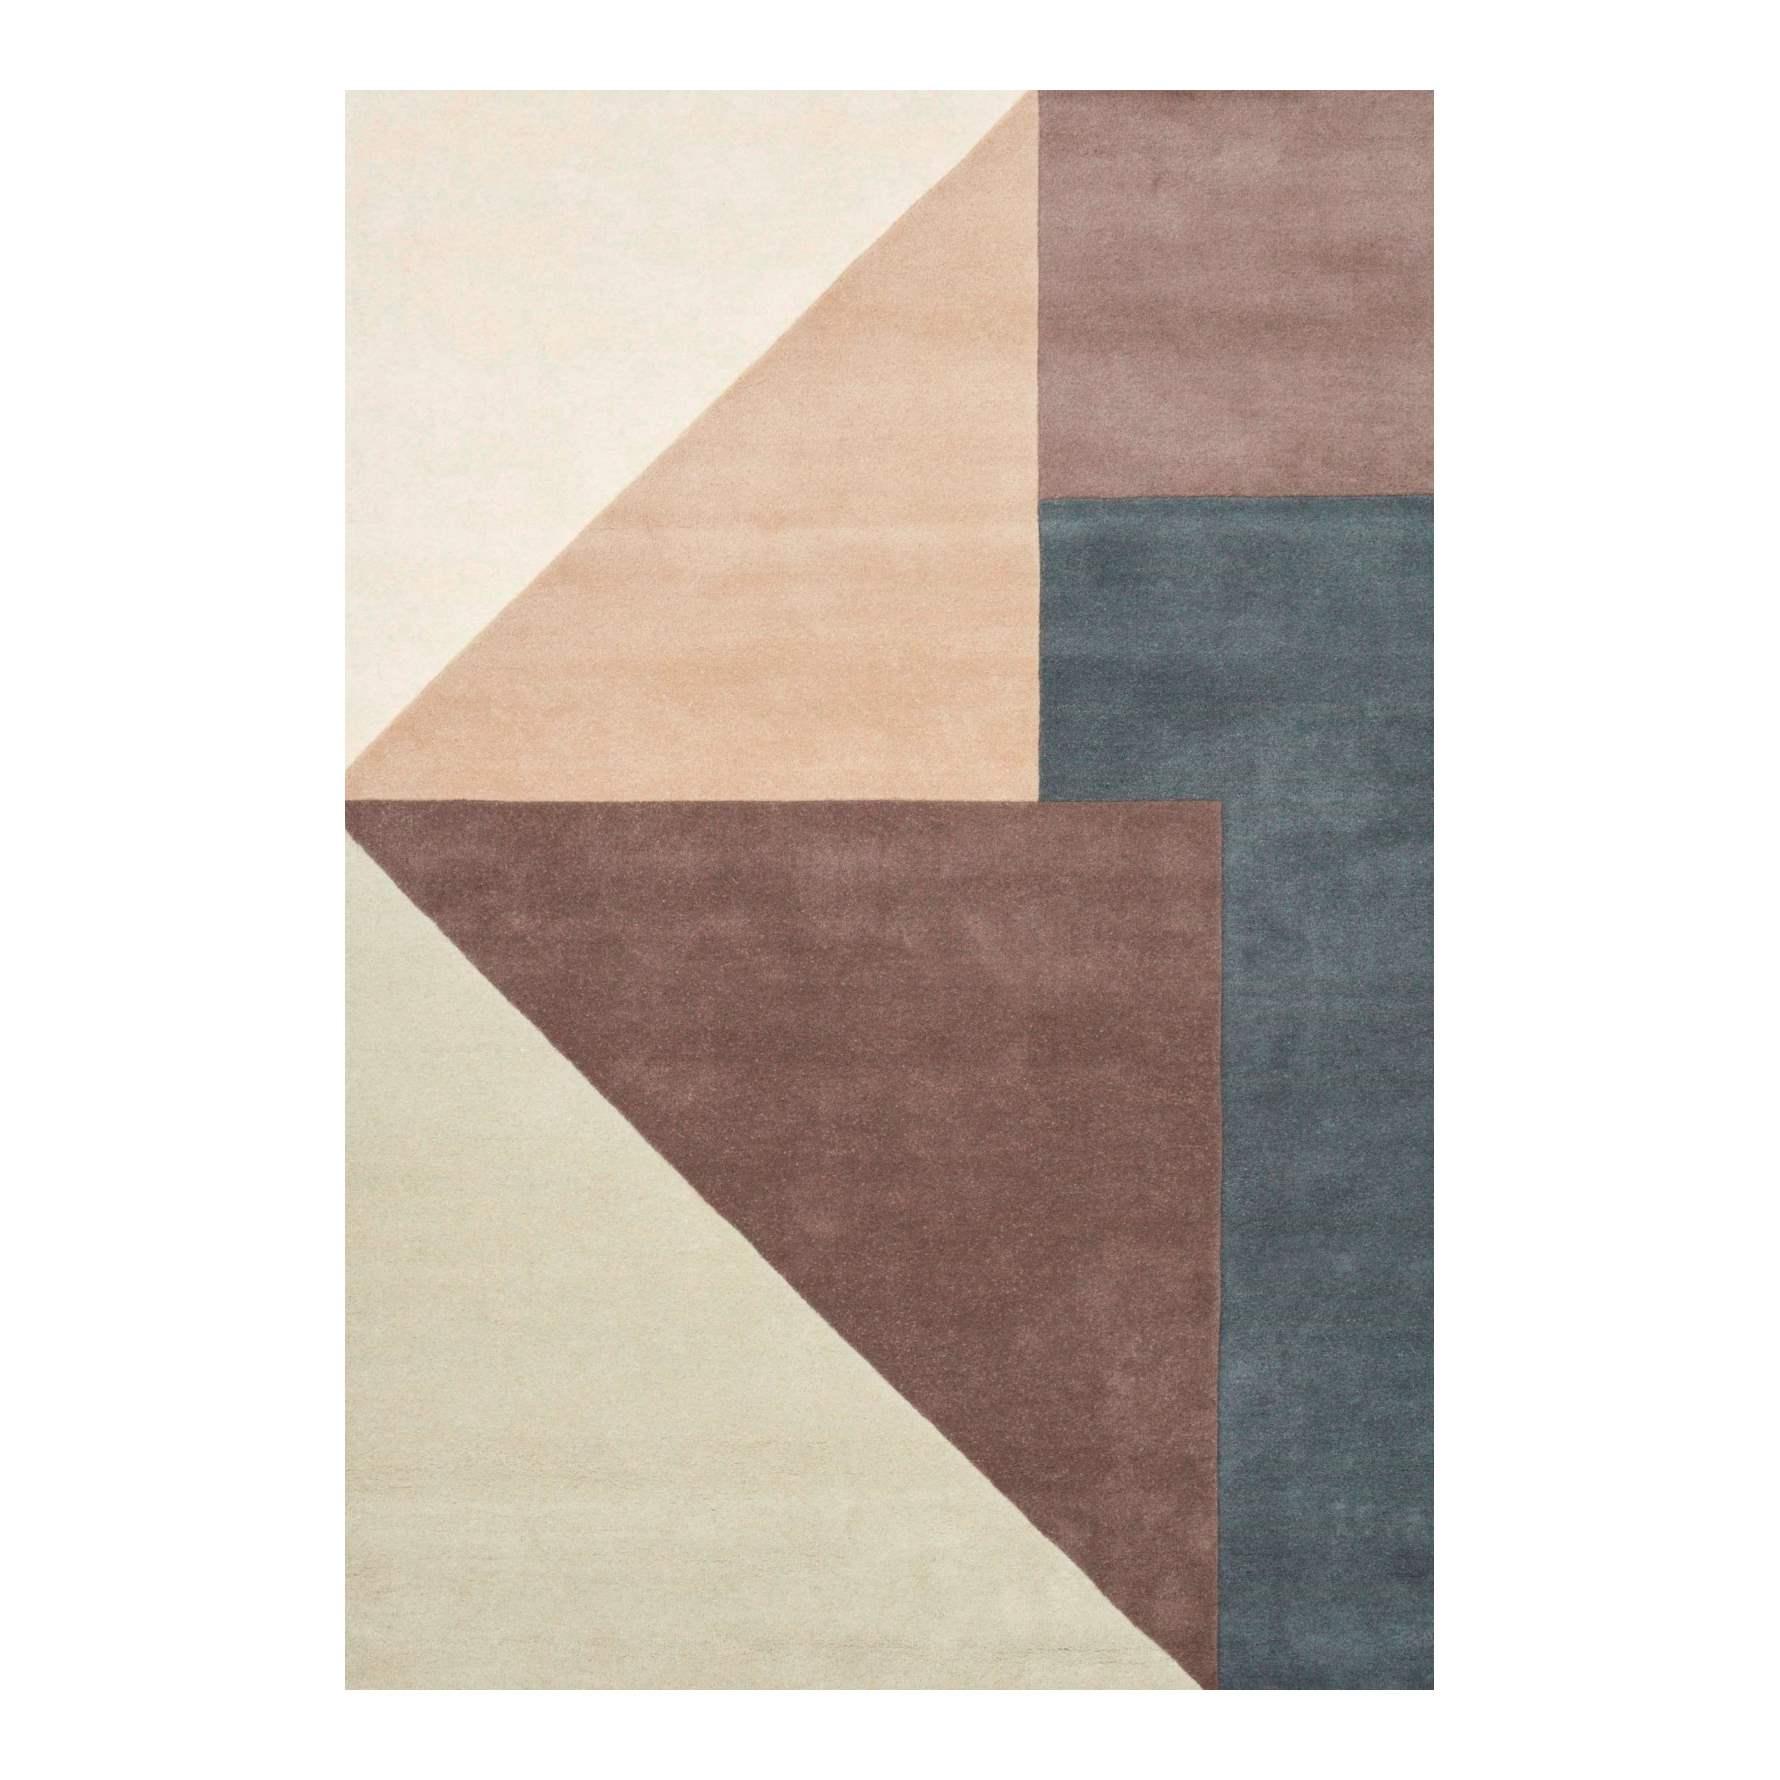 Ullmatta ARGUTO 140 x 200 cm Mixed, Linie Design